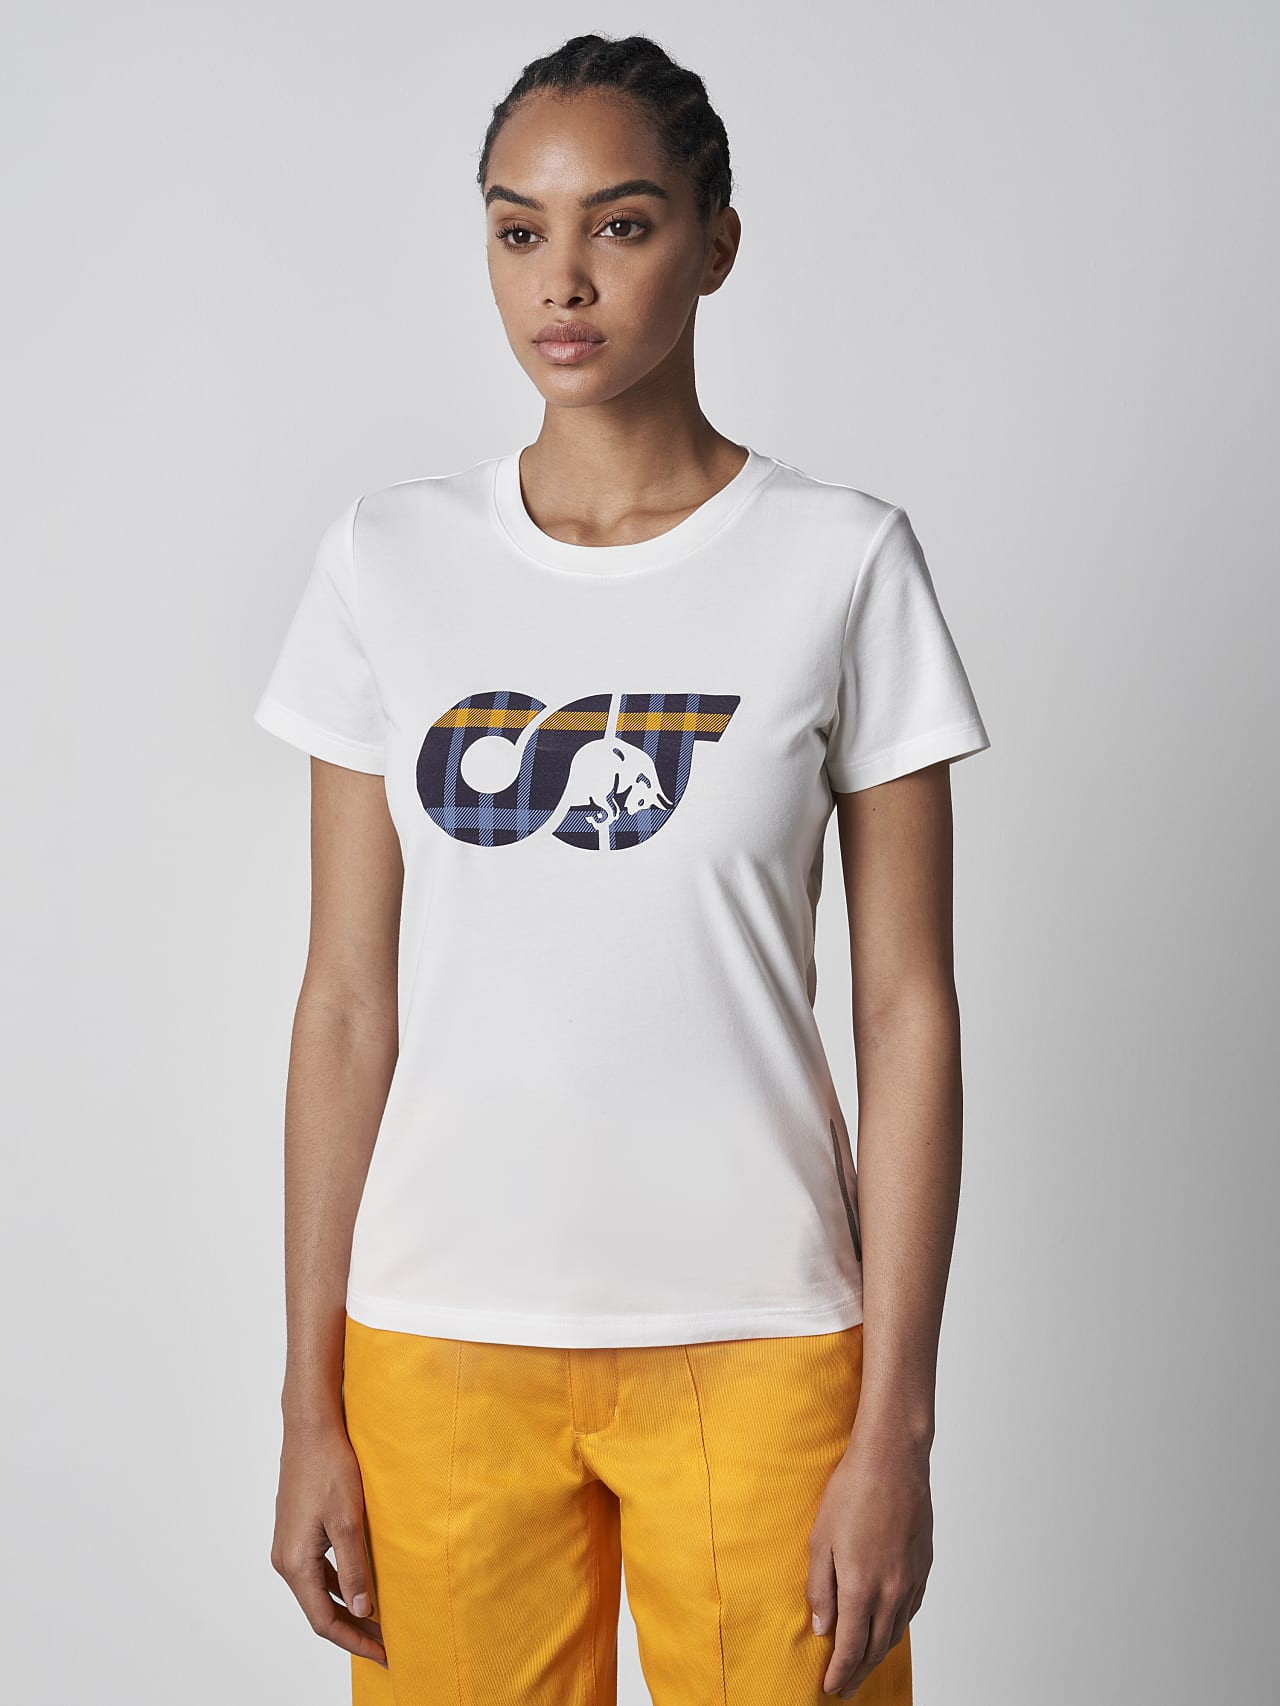 JANPA V1.Y5.02 Logo Print T-Shirt offwhite Model shot Alpha Tauri